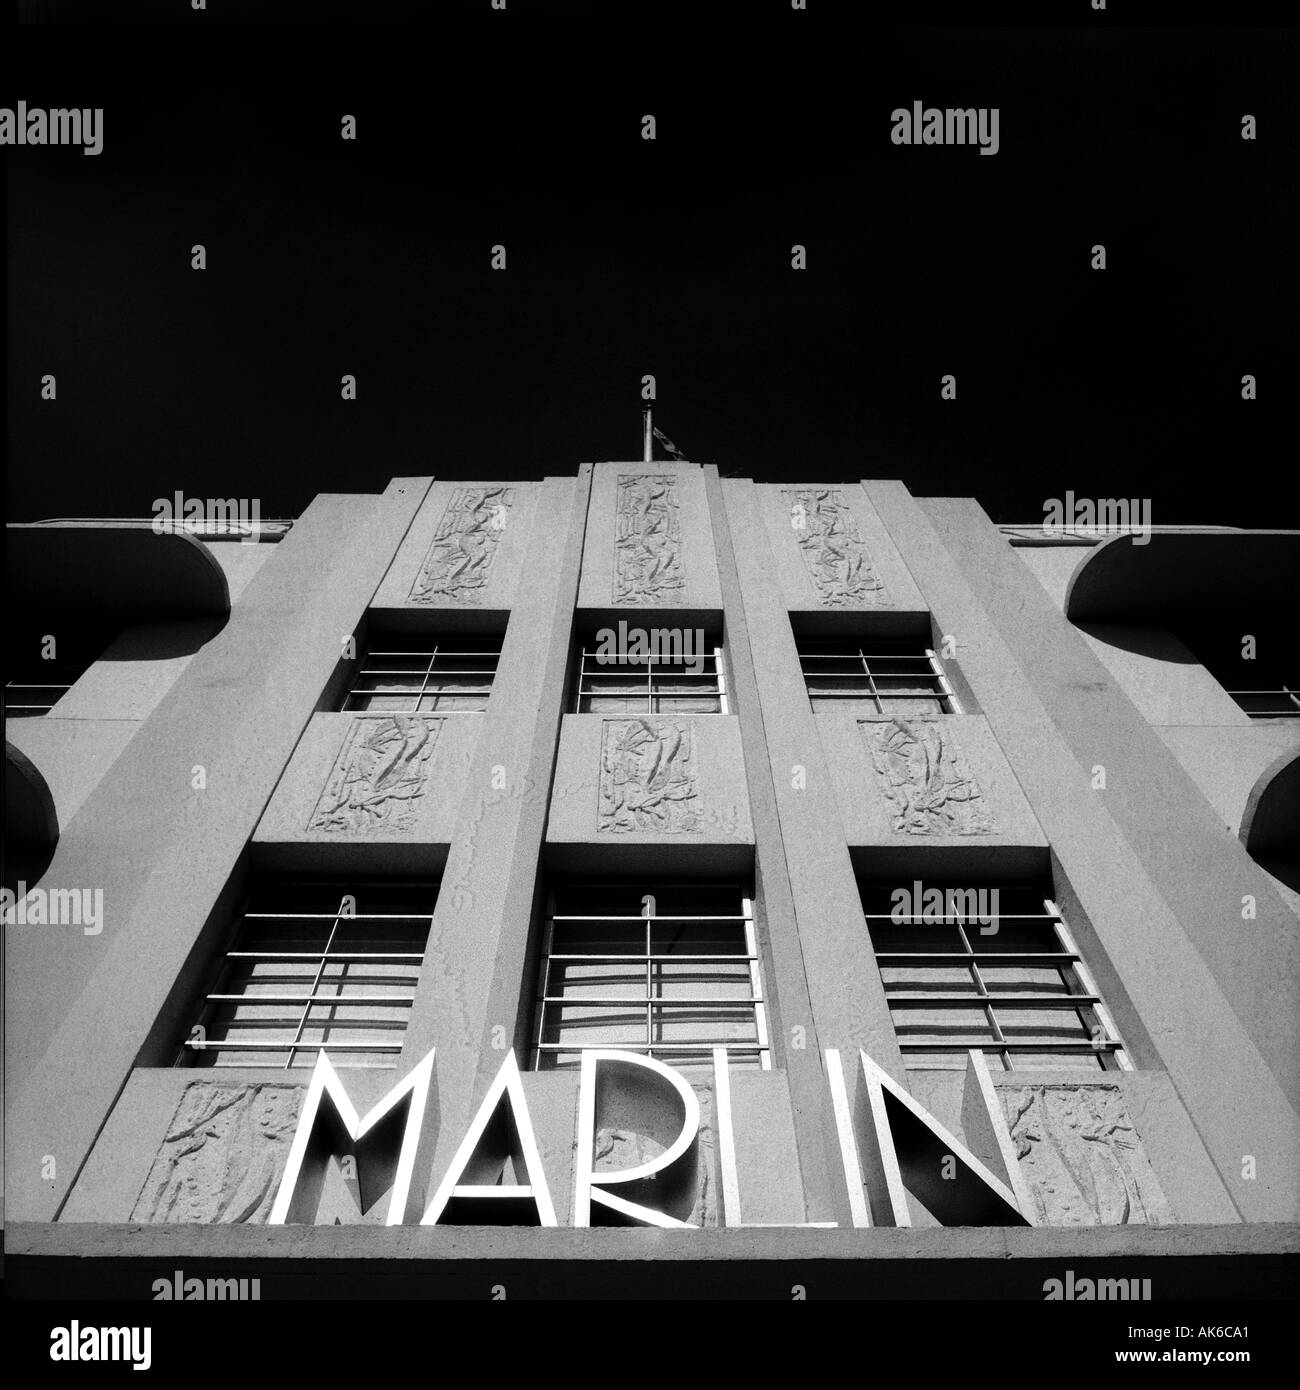 Fassade des Hotels Marlin in s Miami South Beach Art Deco District Stockfoto